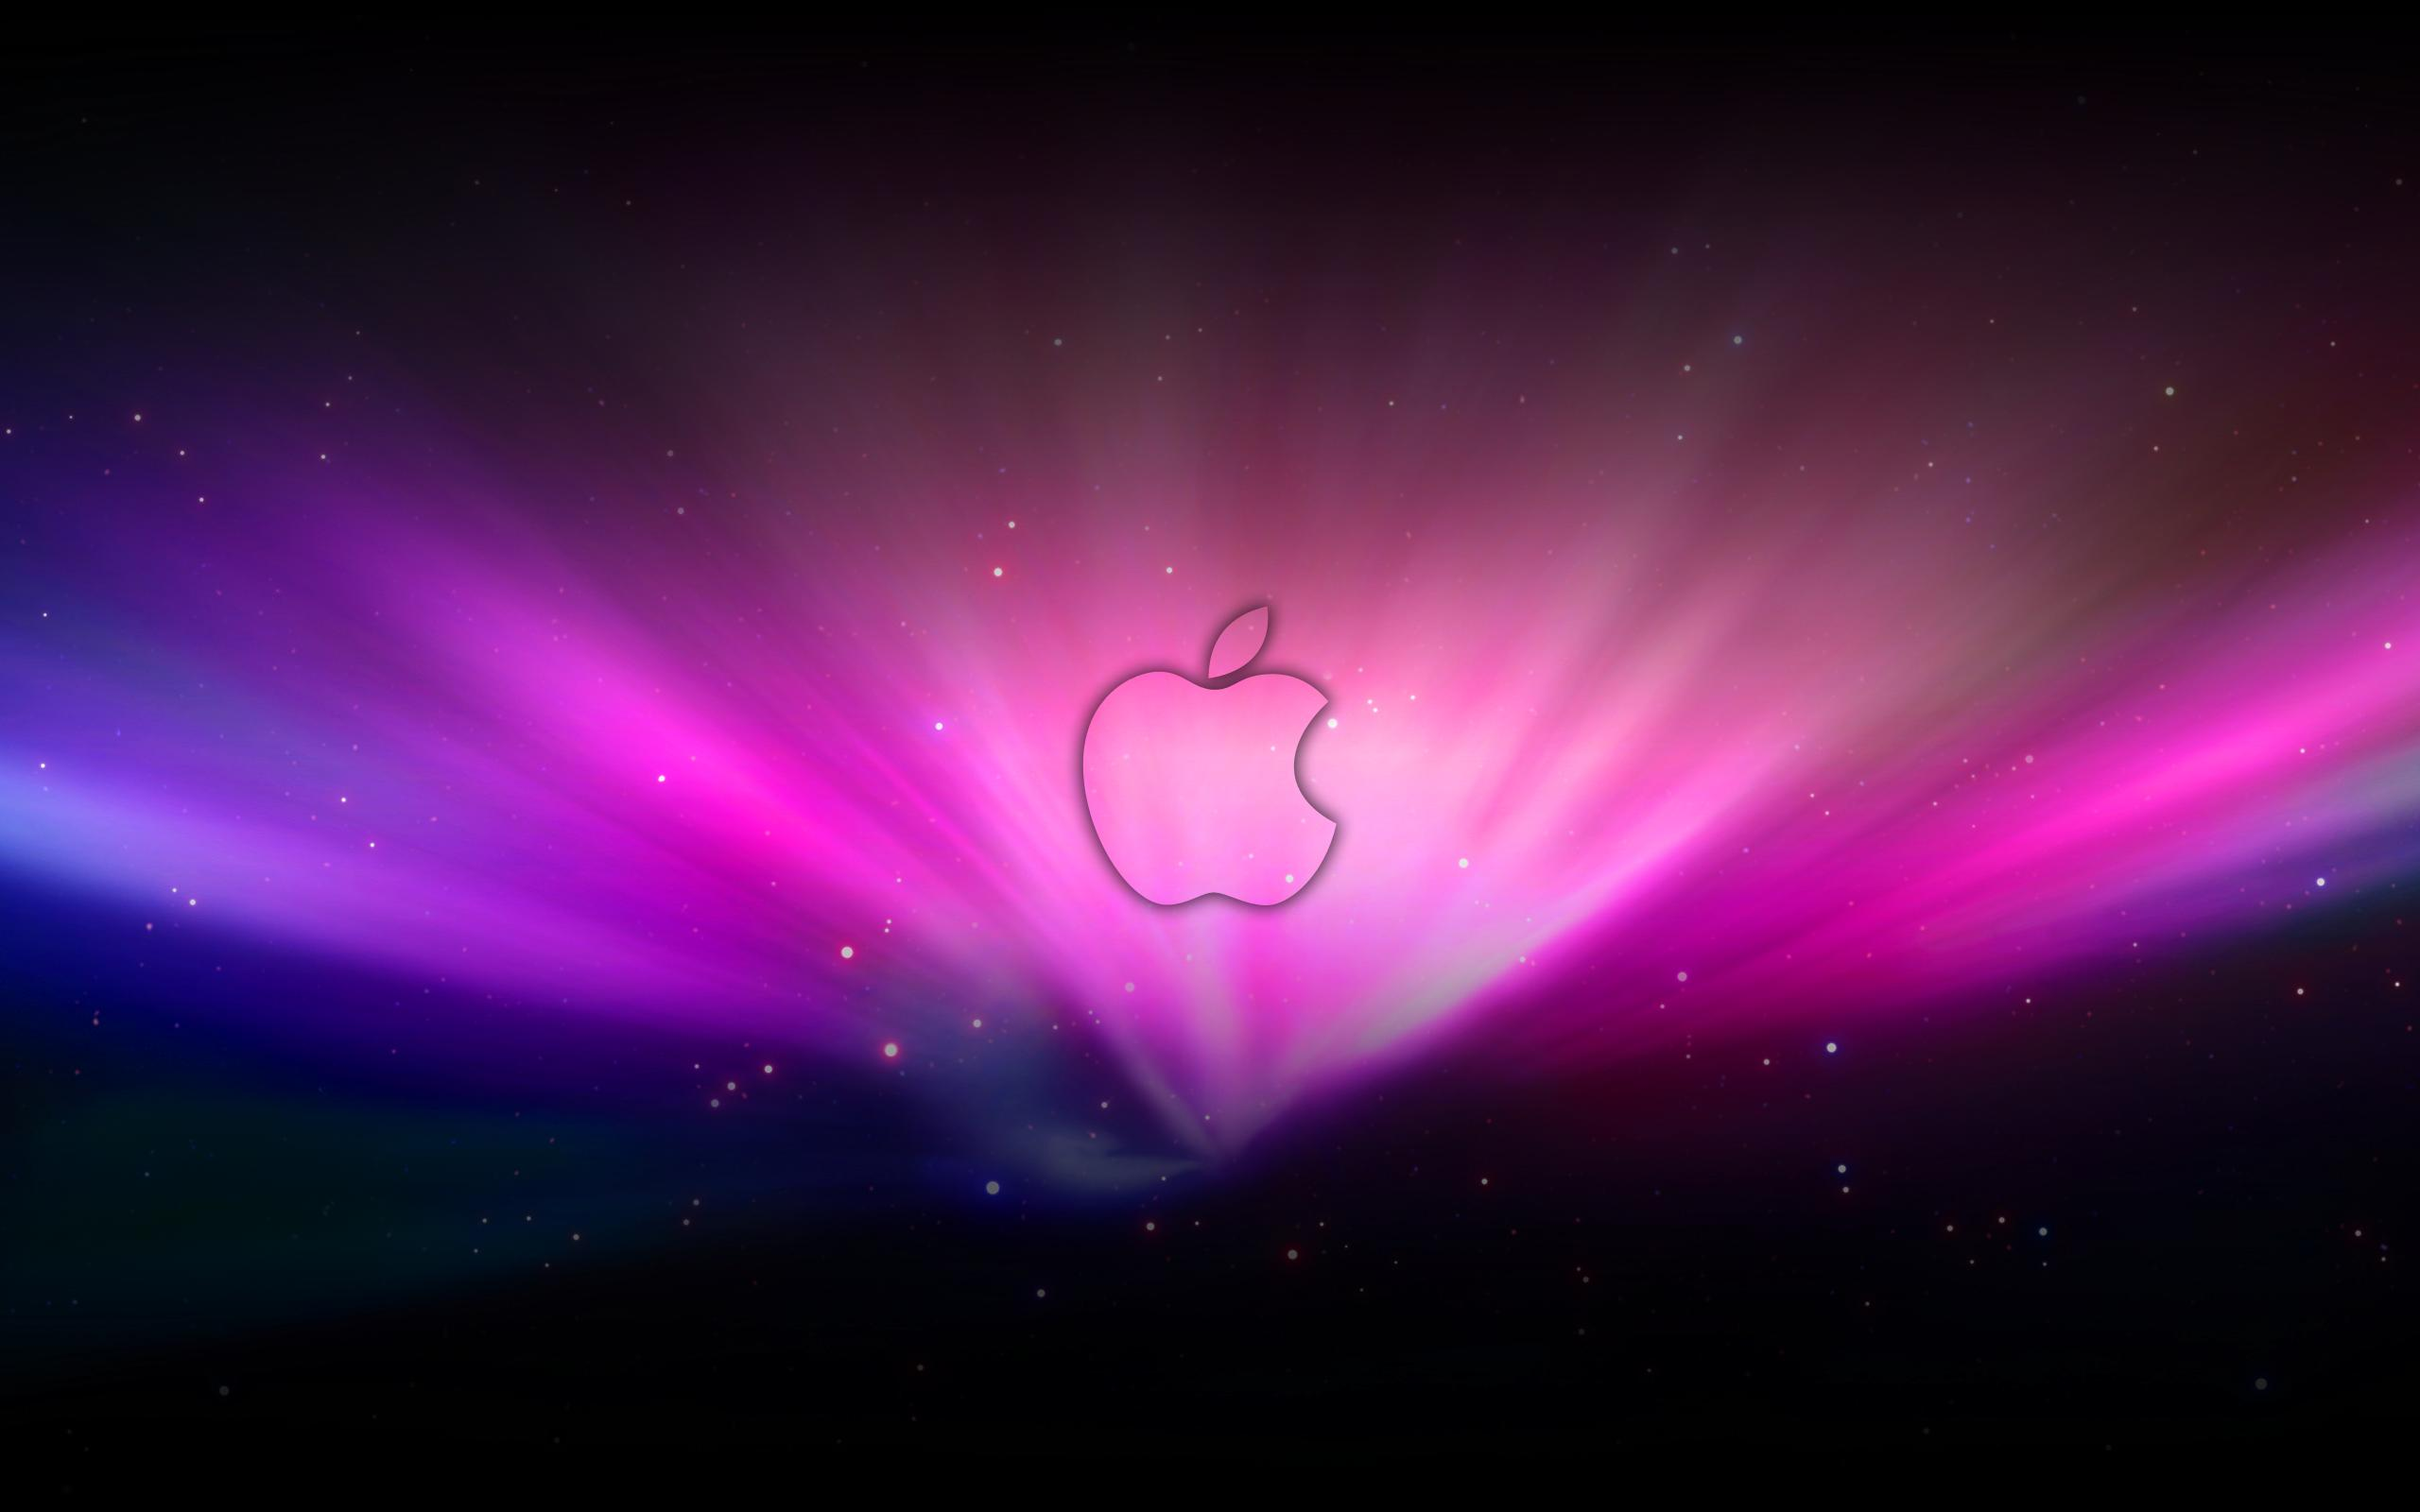 Mac OS Leopard Wallpapers - Wallpaper Cave